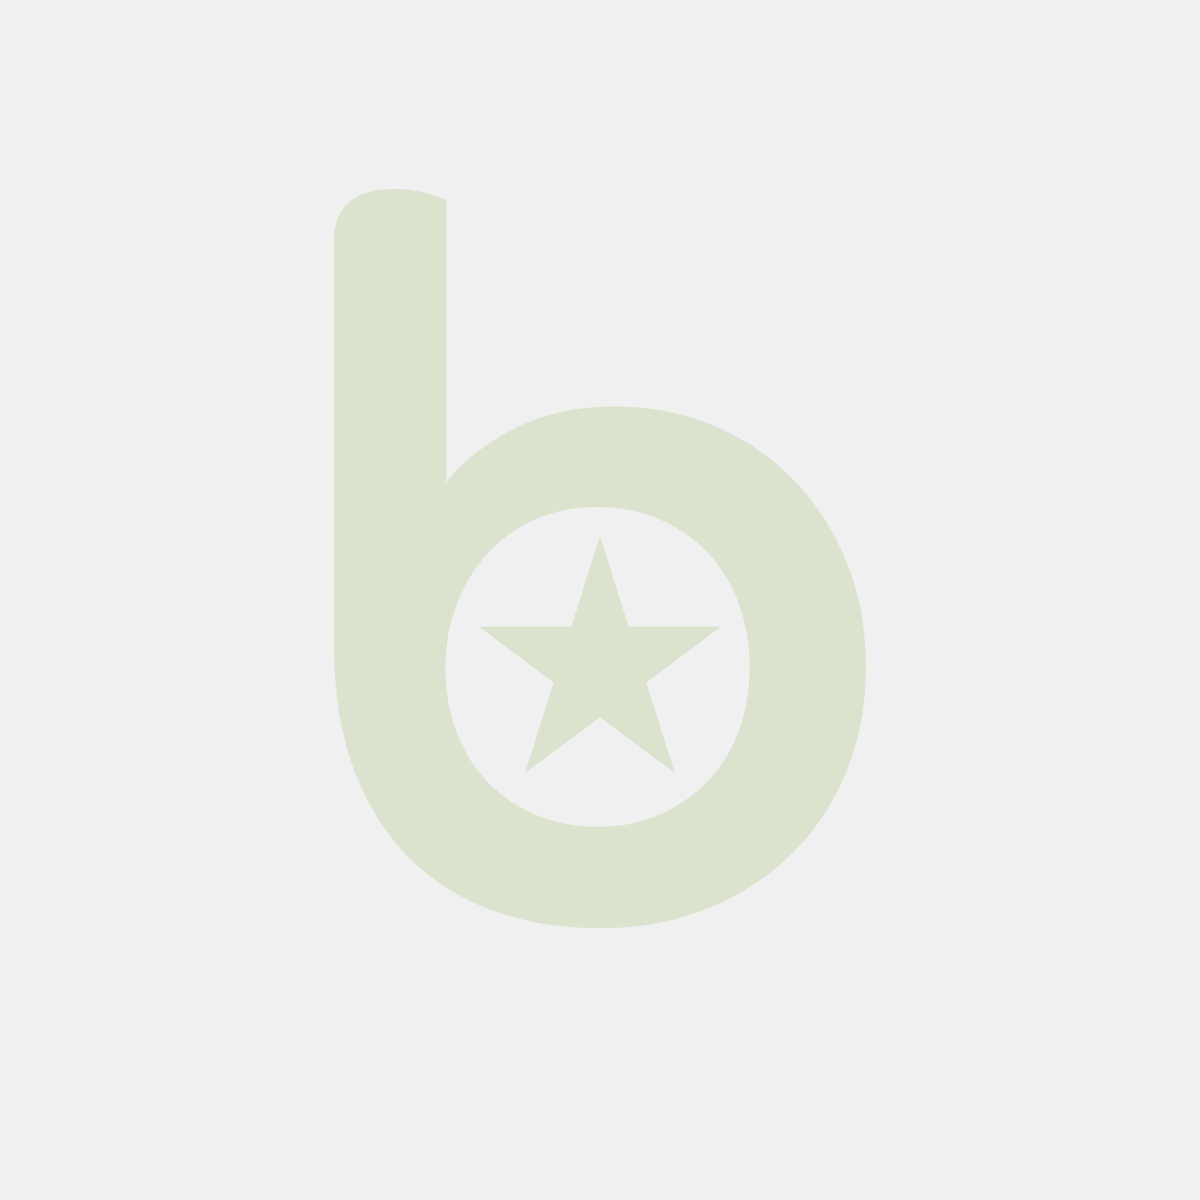 Patyczki 21cm GOLF op. 250szt - FINGERFOOD